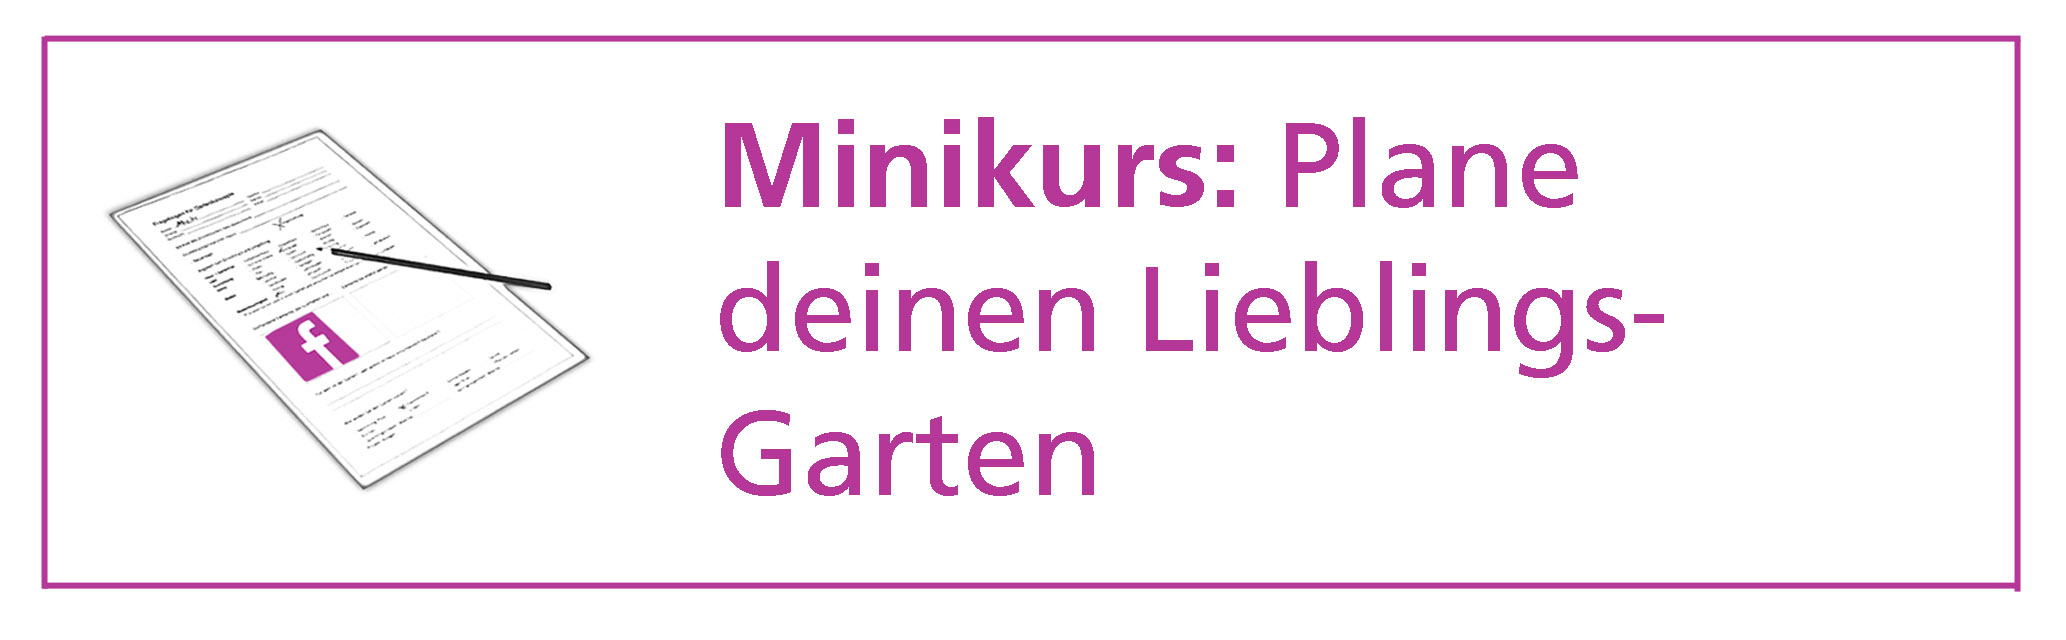 minikurs_garden_garten_gartengestaltung_blog